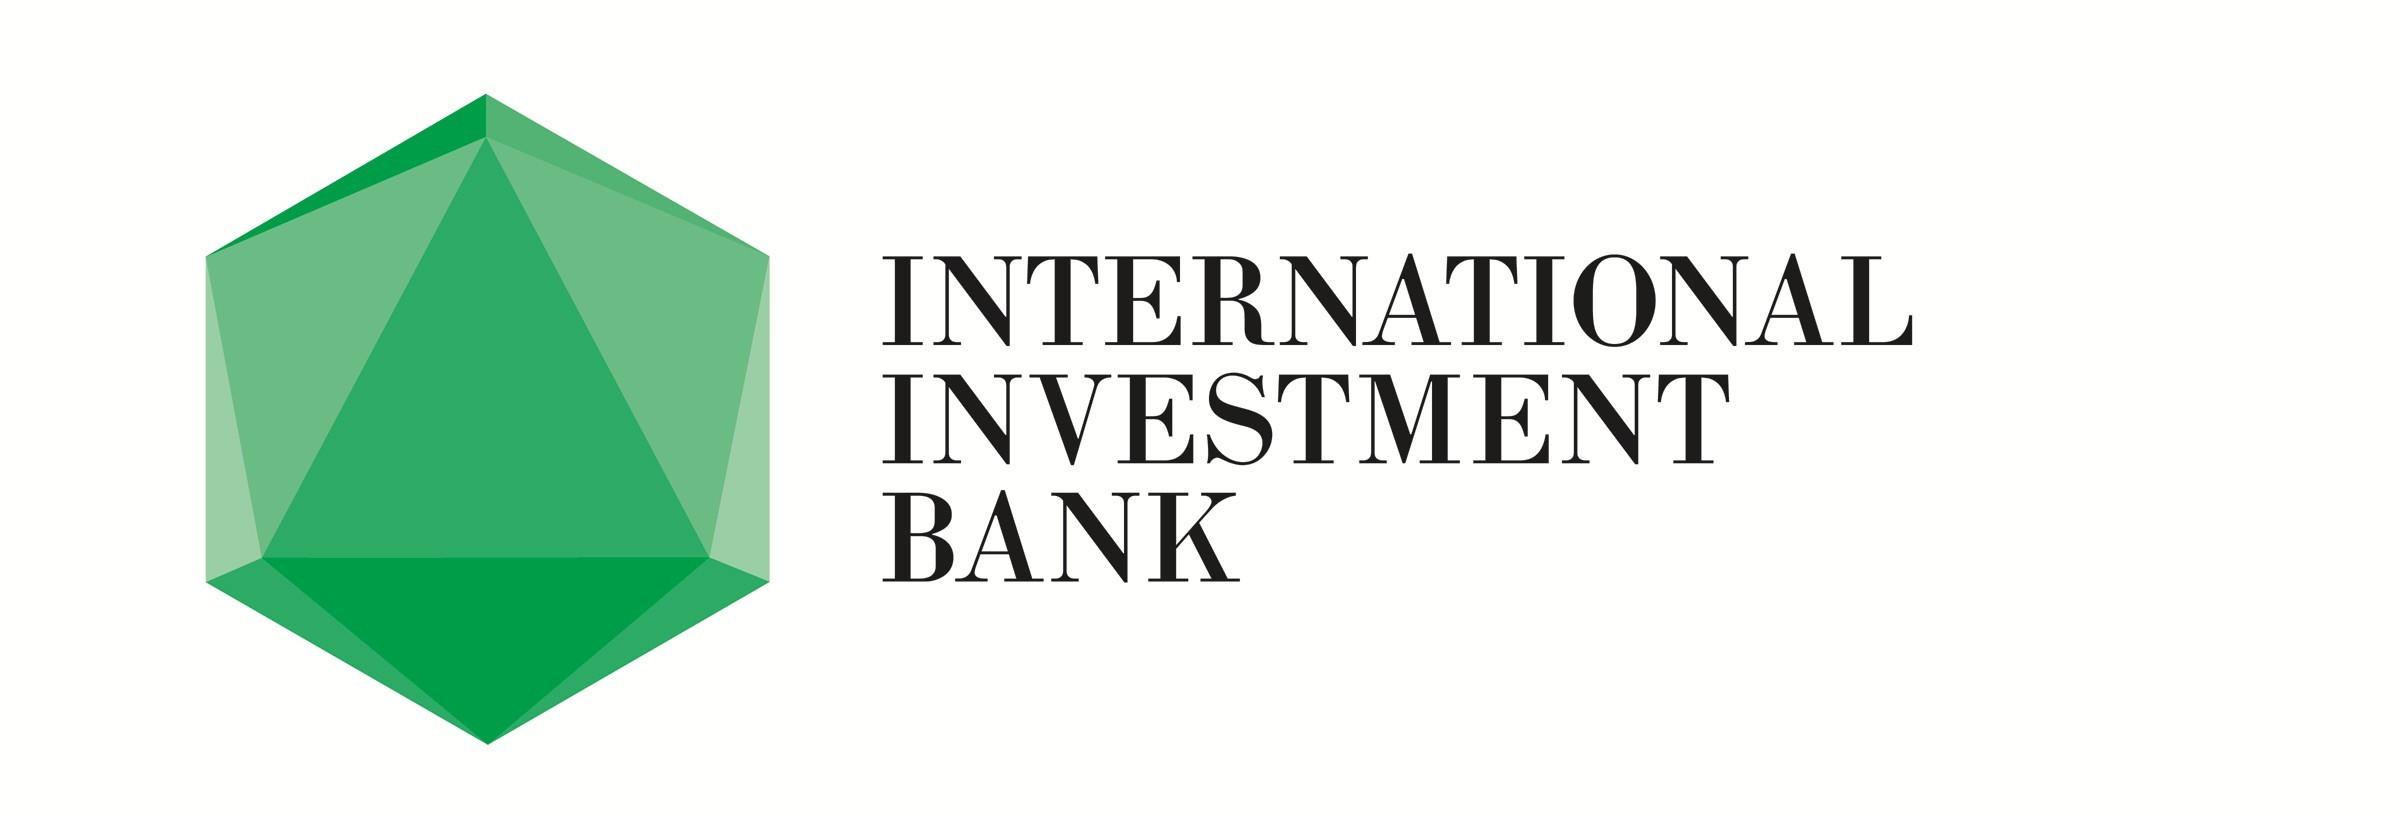 International Investment Bank (iib)  Iib Signs Its Debut